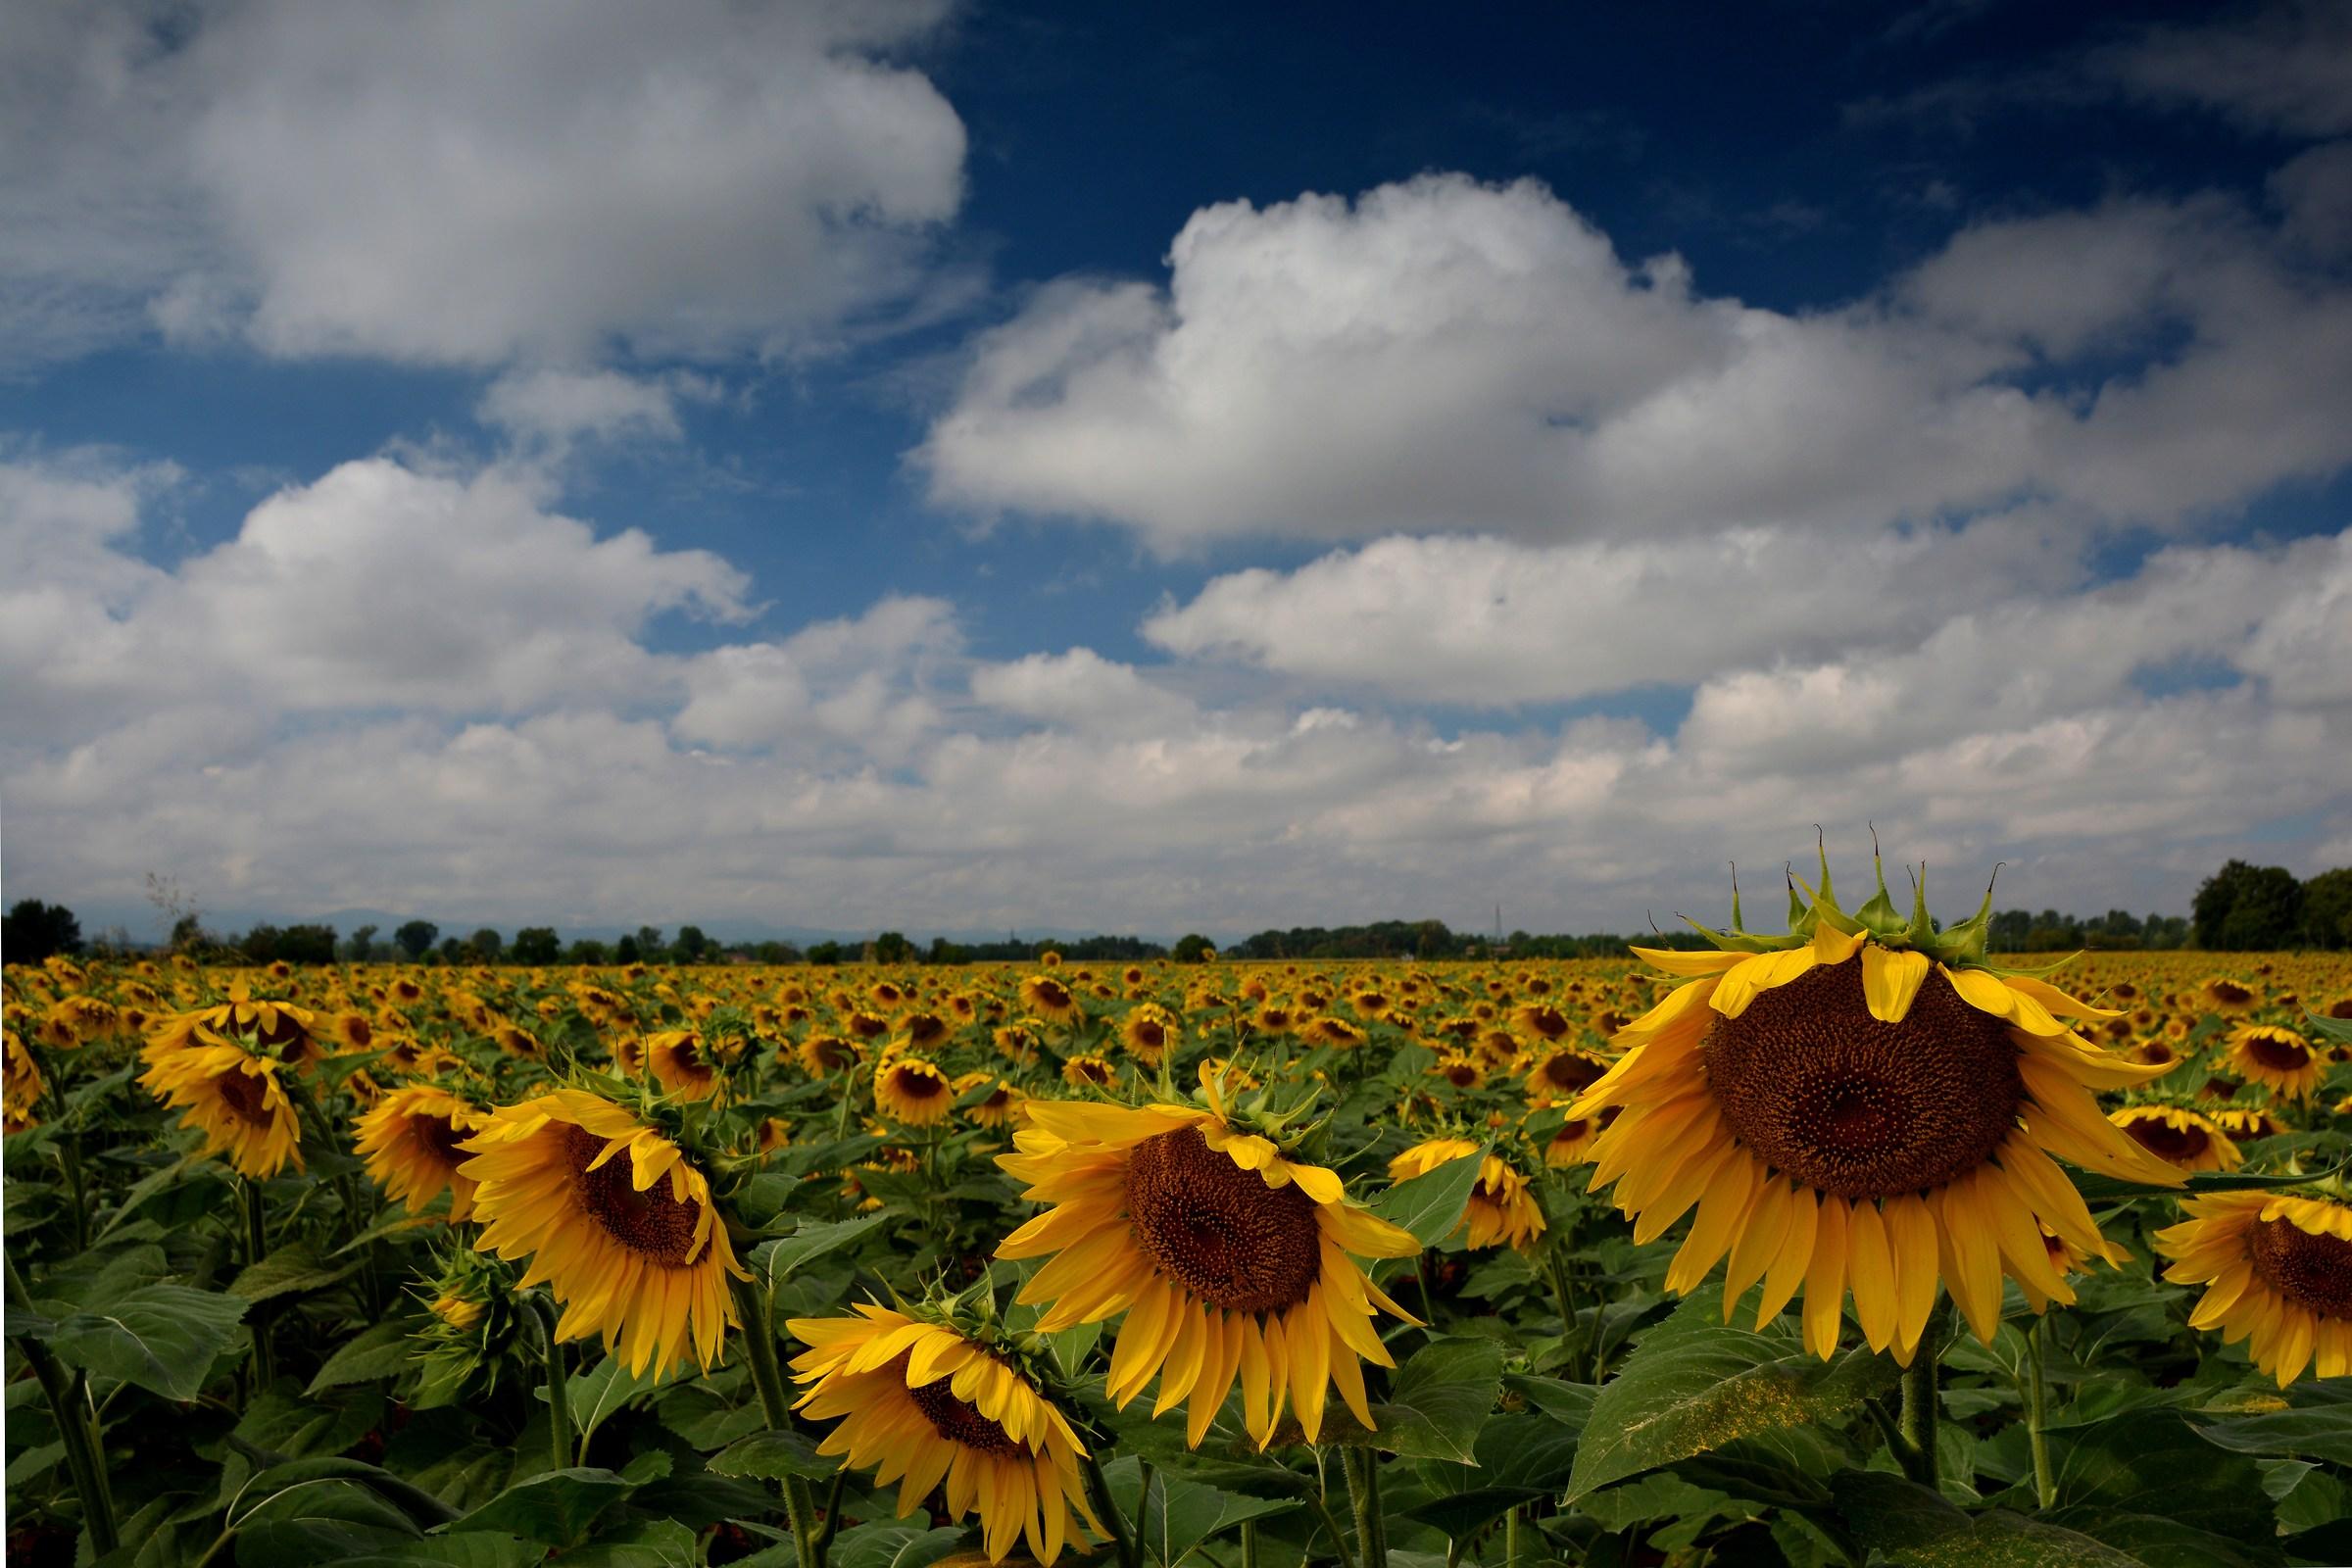 end season of sunflowers ......